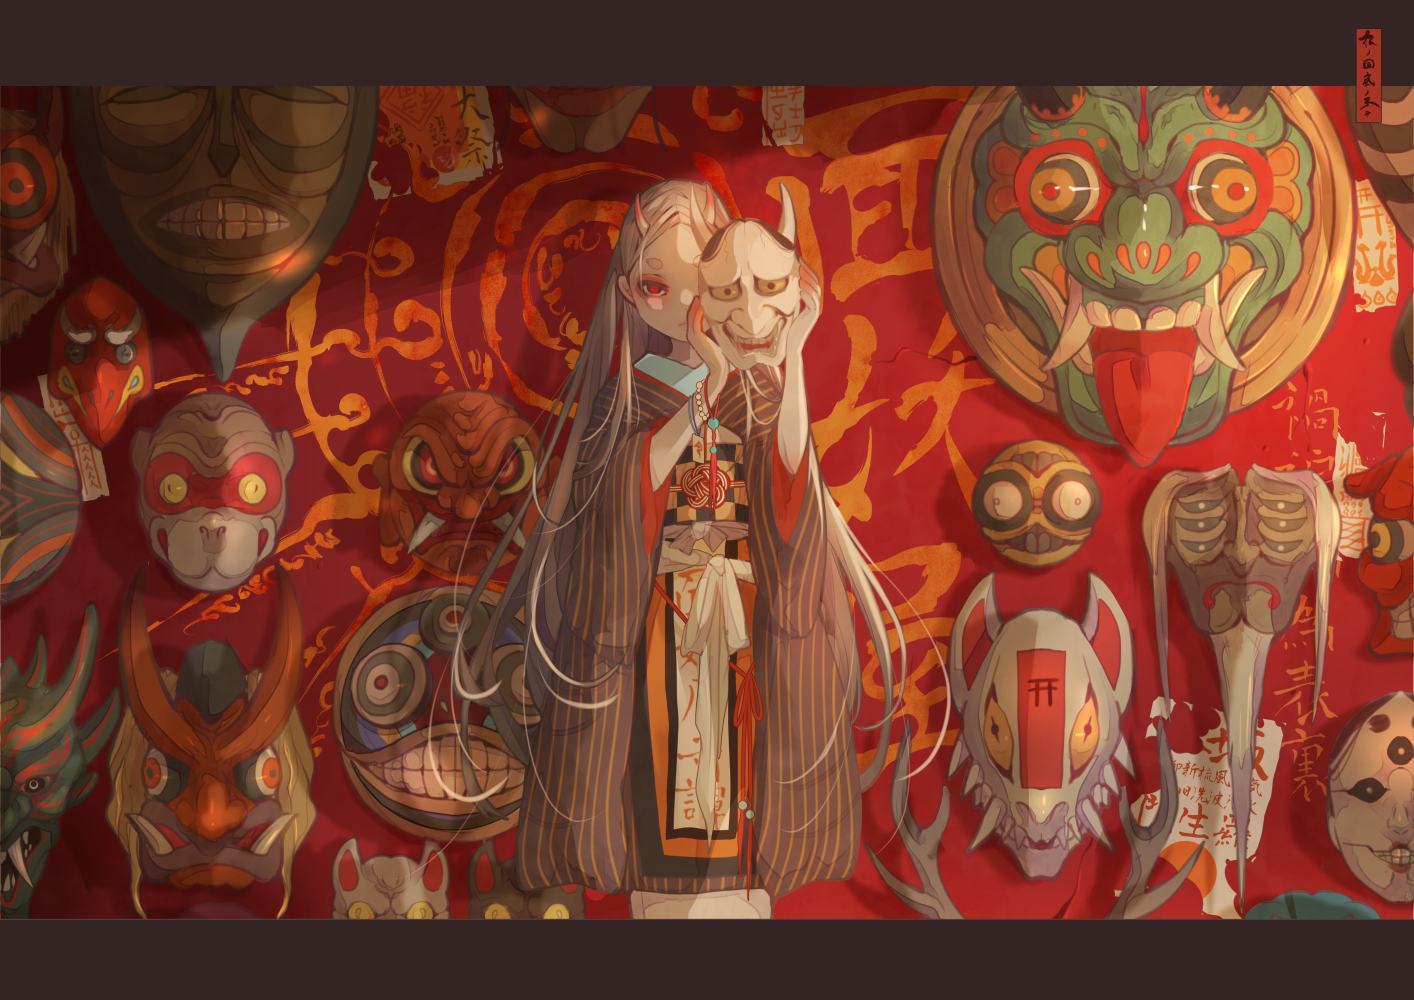 demon horns japanese_clothes kimono long_hair mask nanahara_shie original red_eyes white_hair